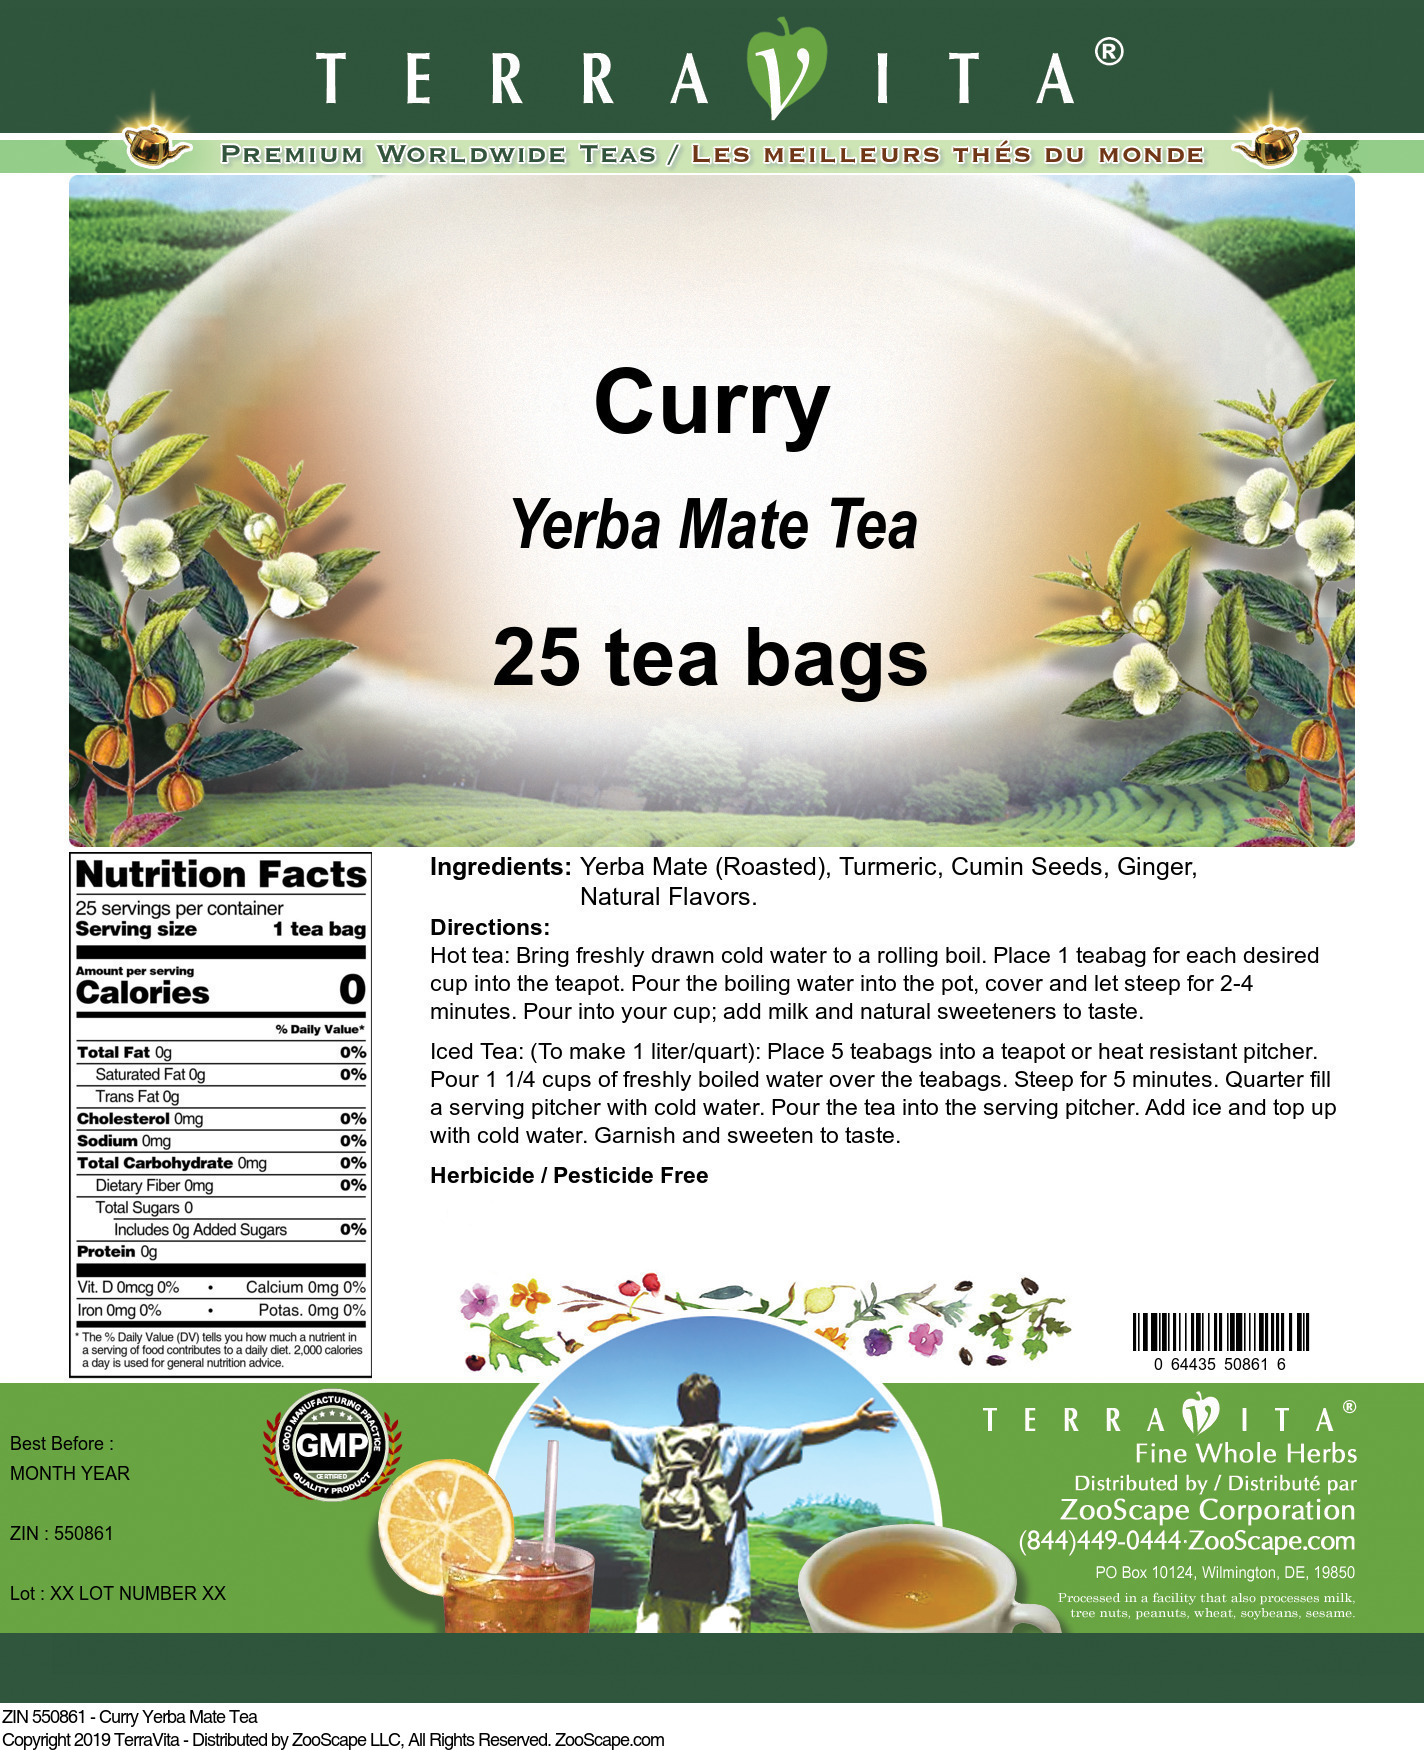 Curry Yerba Mate